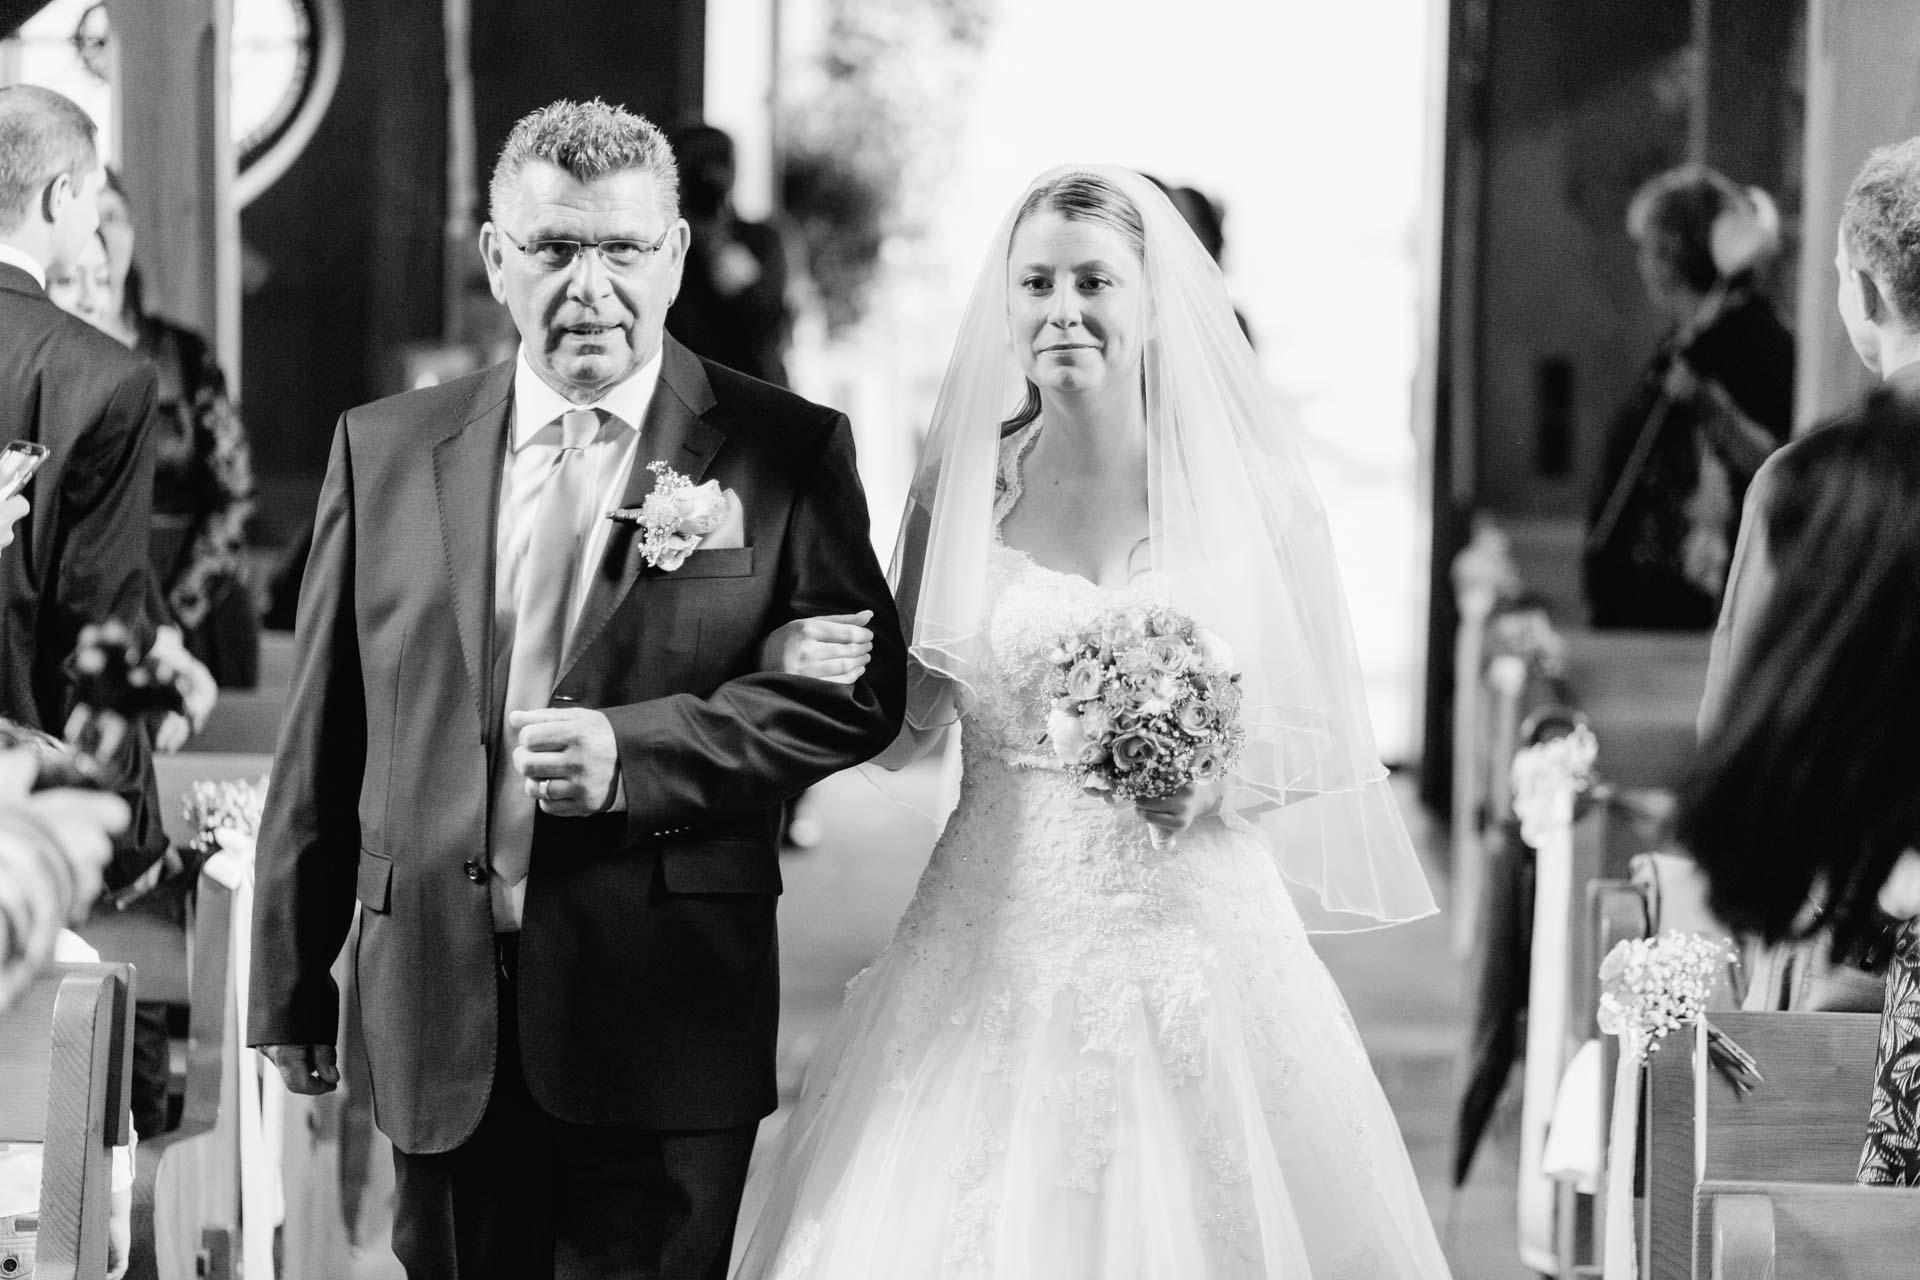 Dana_Michael_Hochzeit_Muttenz_2016-15